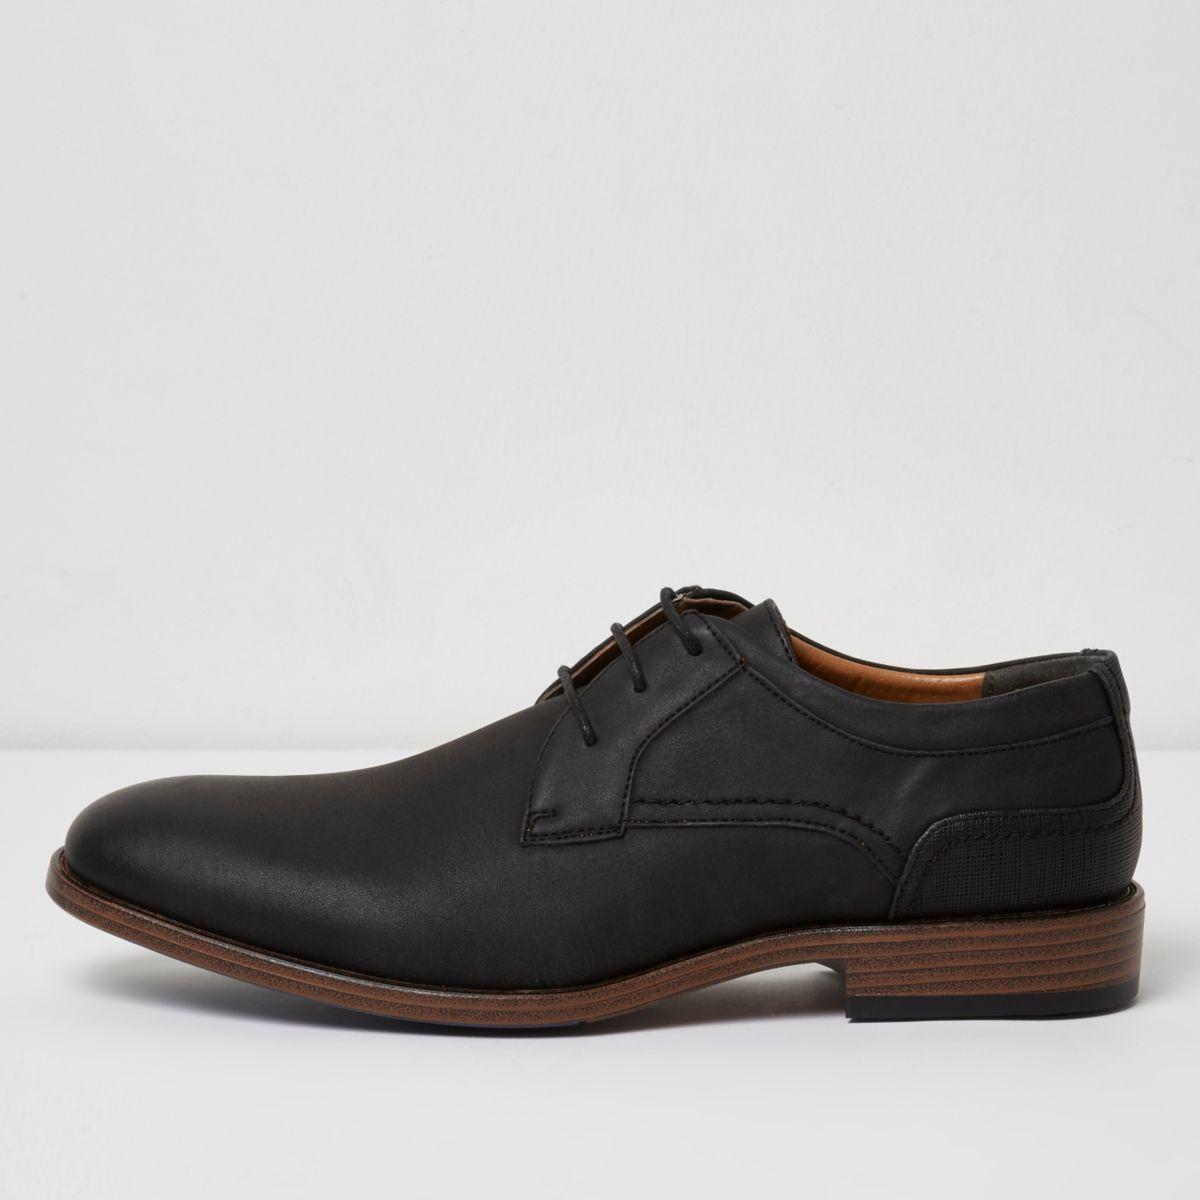 Black embossed formal shoes